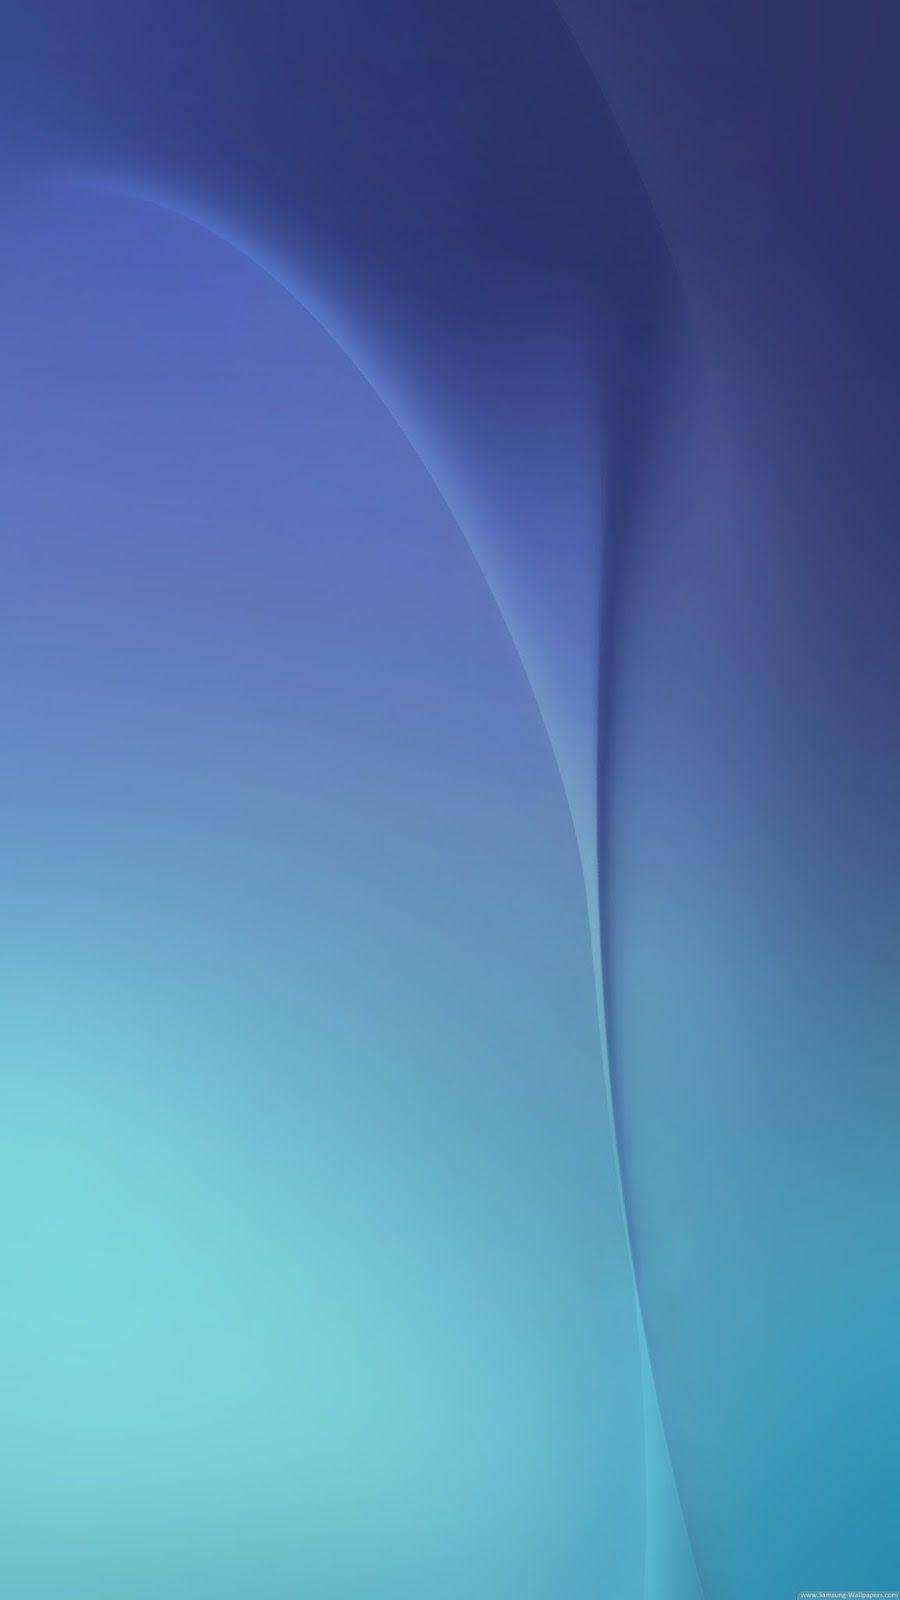 Hd wallpaper samsung - Samsung Galaxy S6 Hd Wallpapers 01 Jpg 900